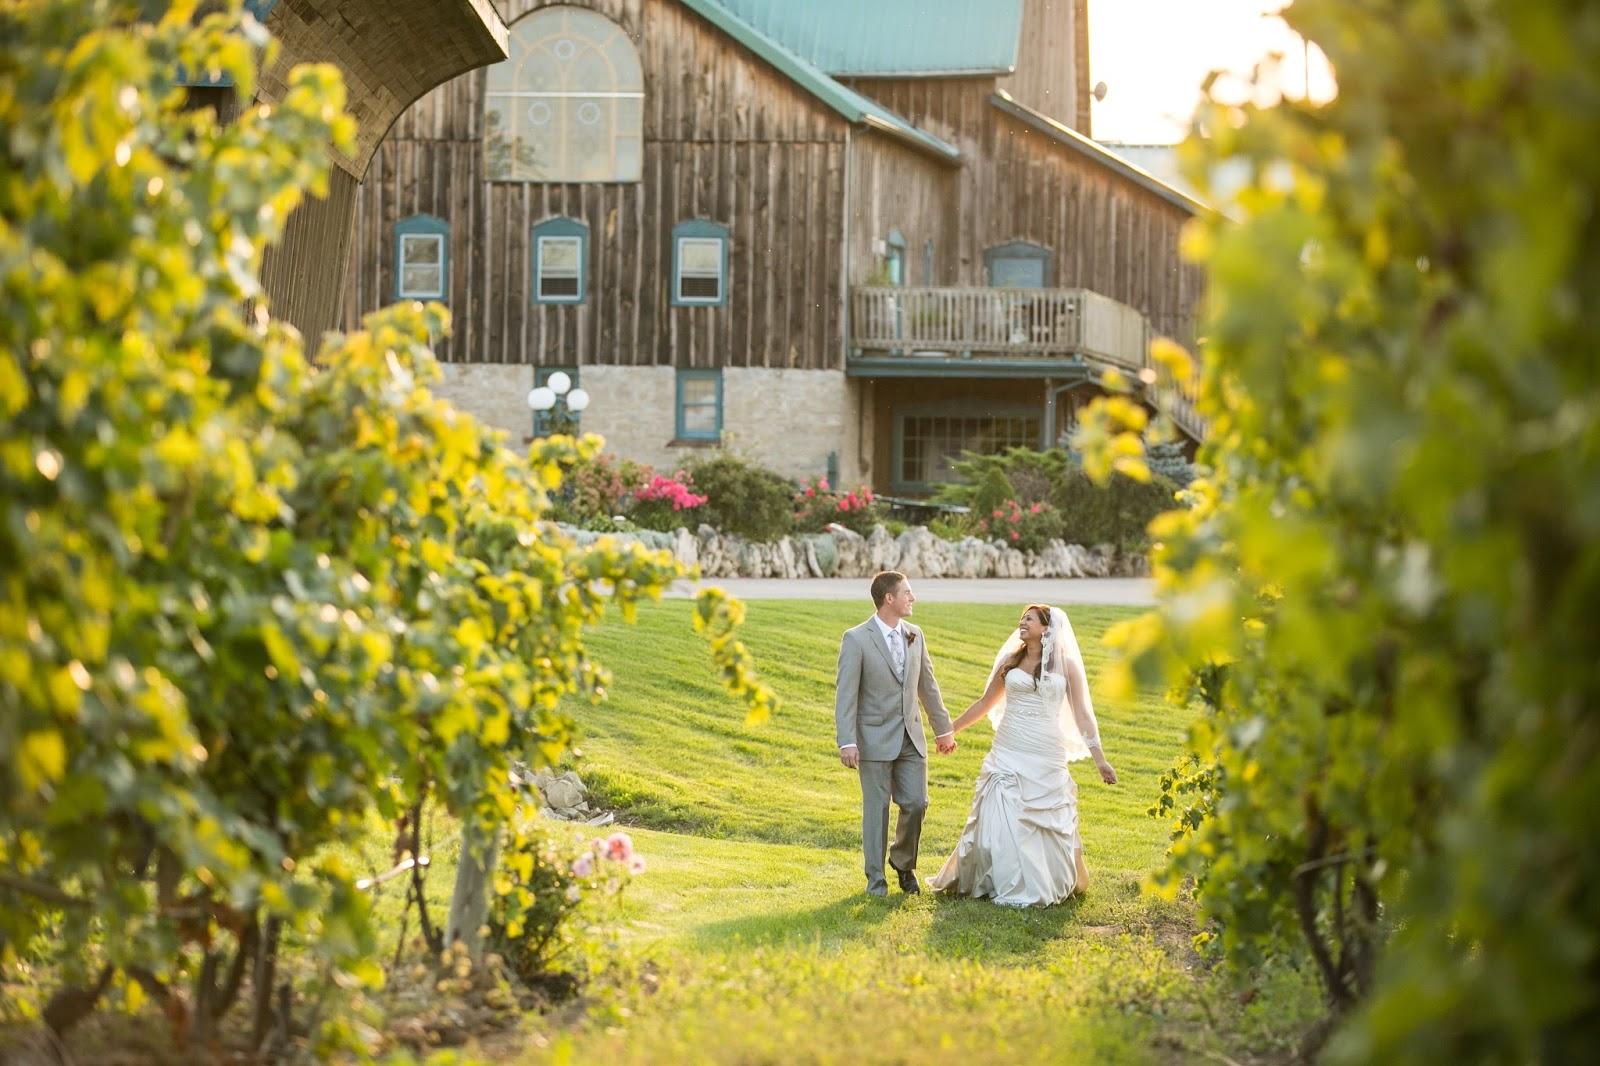 Vineyard wedding inspiration // the-lifestyle-project.com